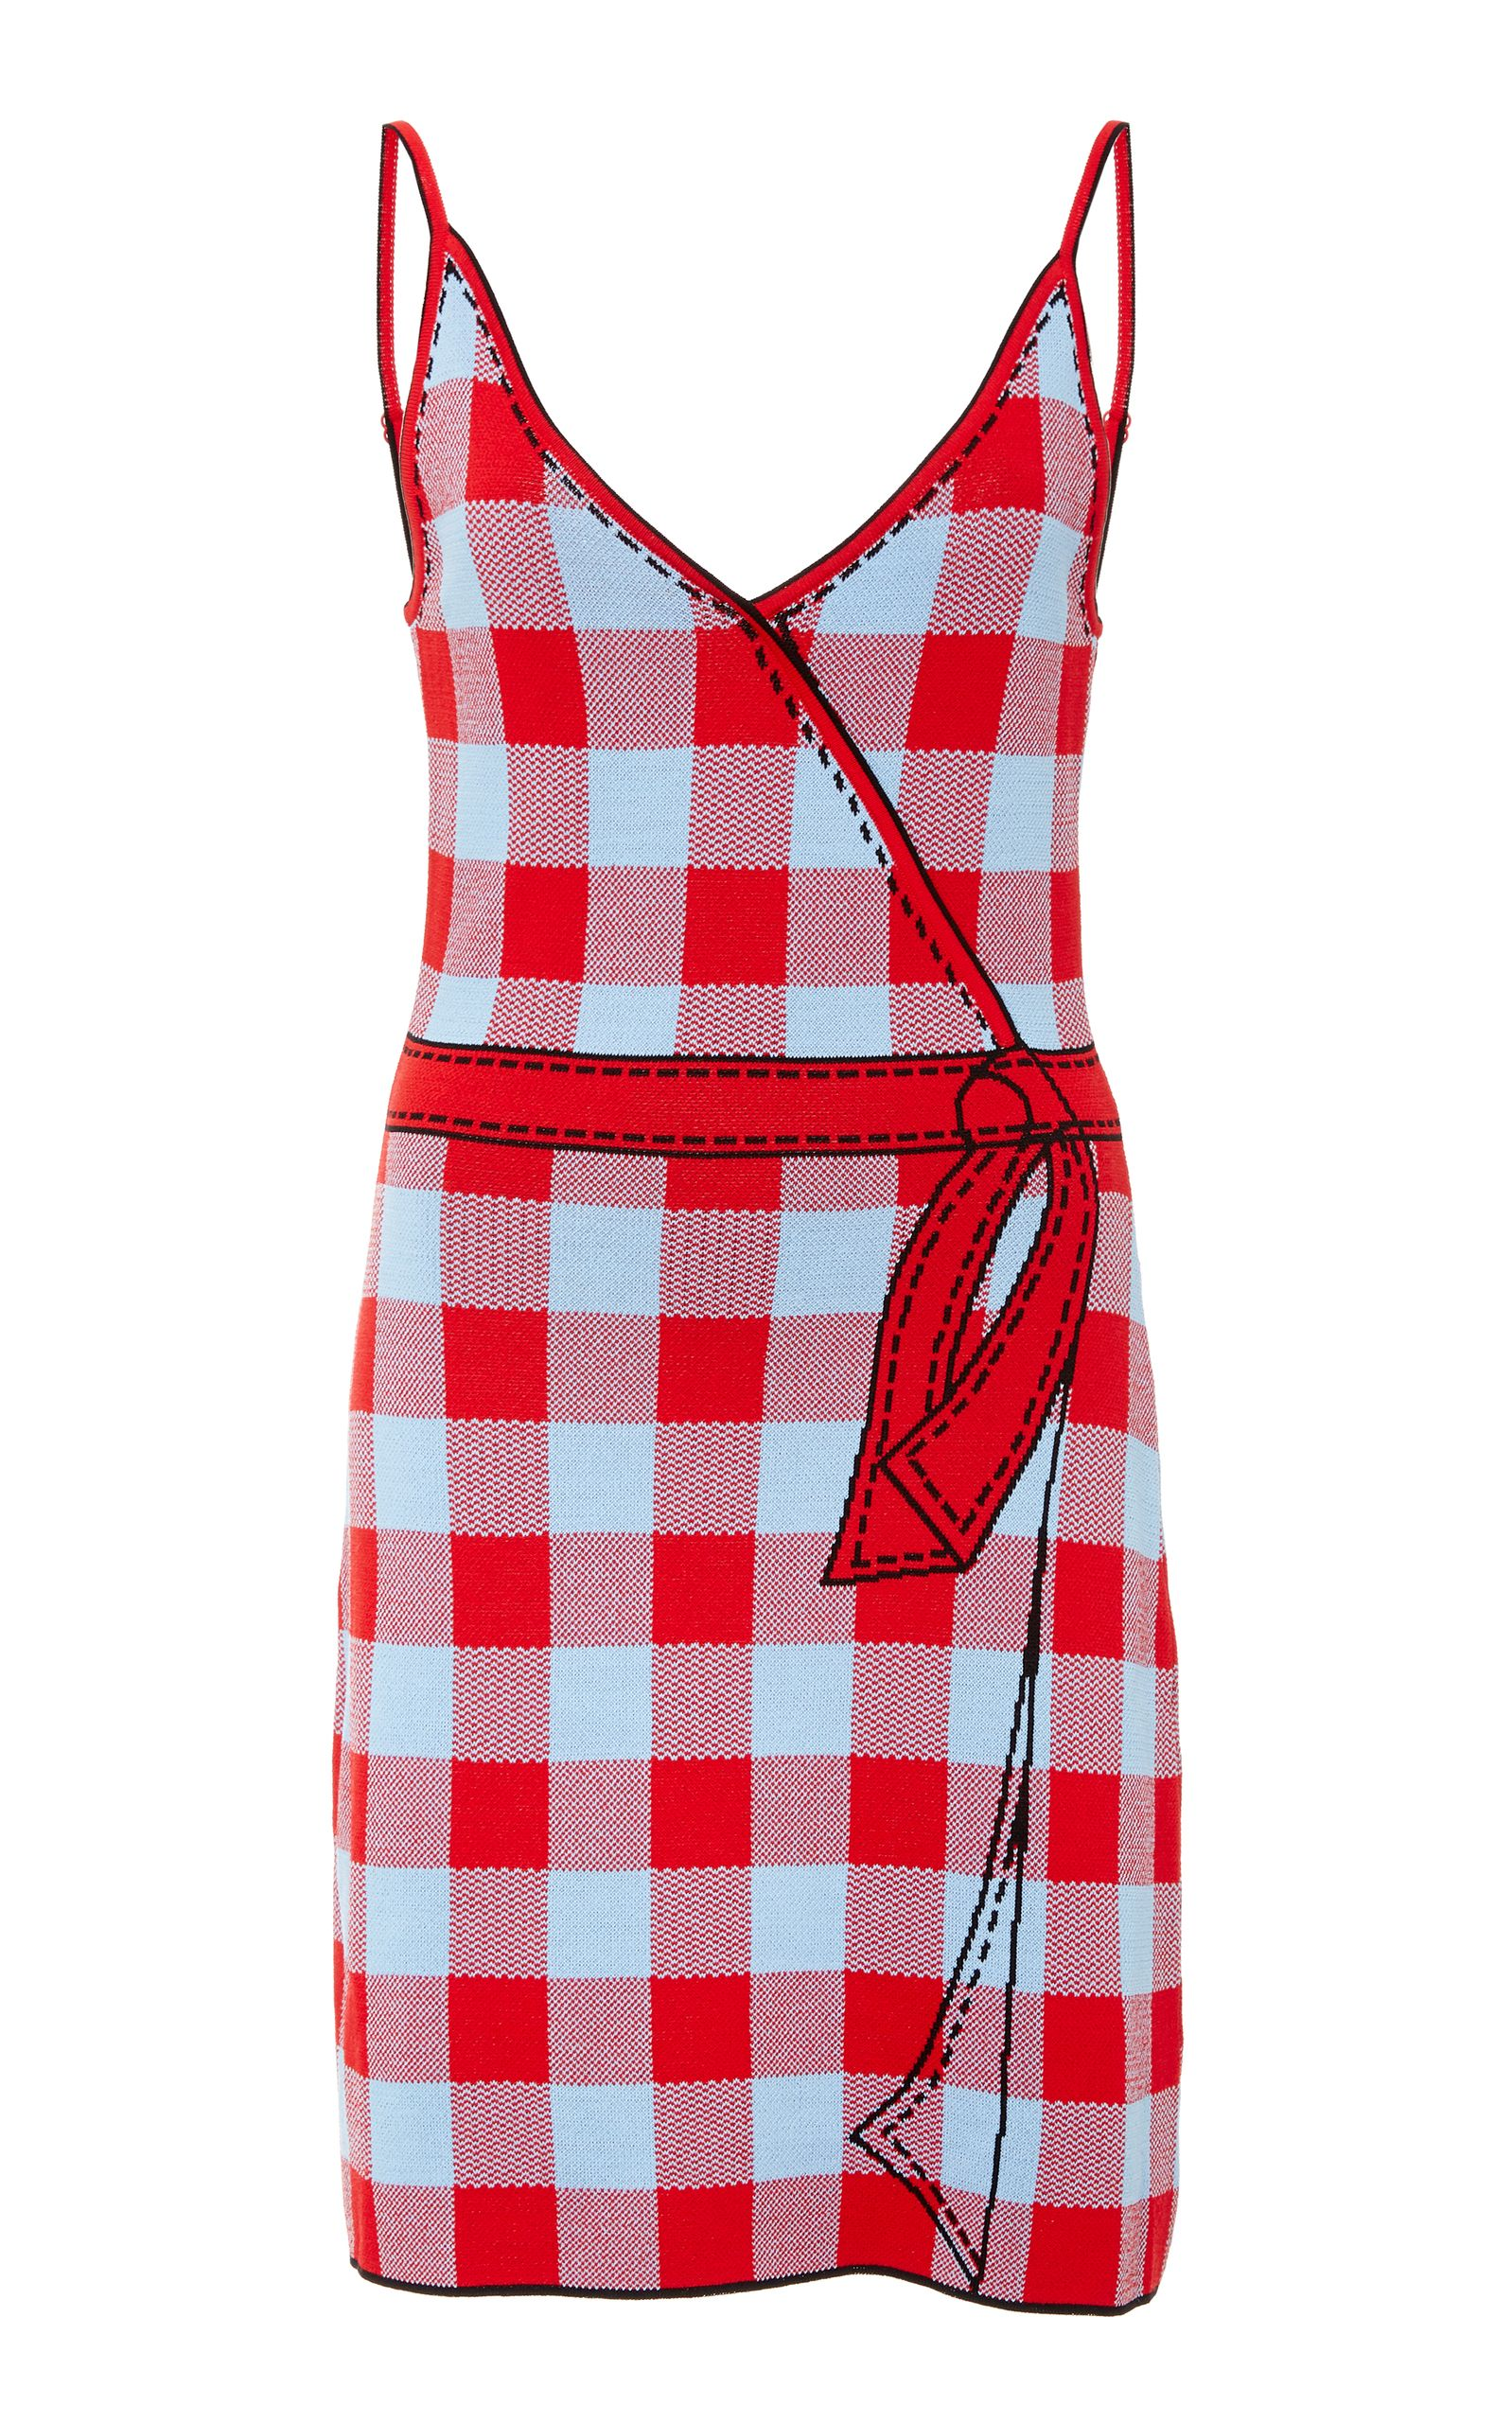 426a0cb63477 ADAM SELMAN ADAM SELMAN SECRET AGENDA SLIP DRESS. #adamselman #cloth # | Adam  Selman | Pinterest | Dresses, Slip on and Gingham dress